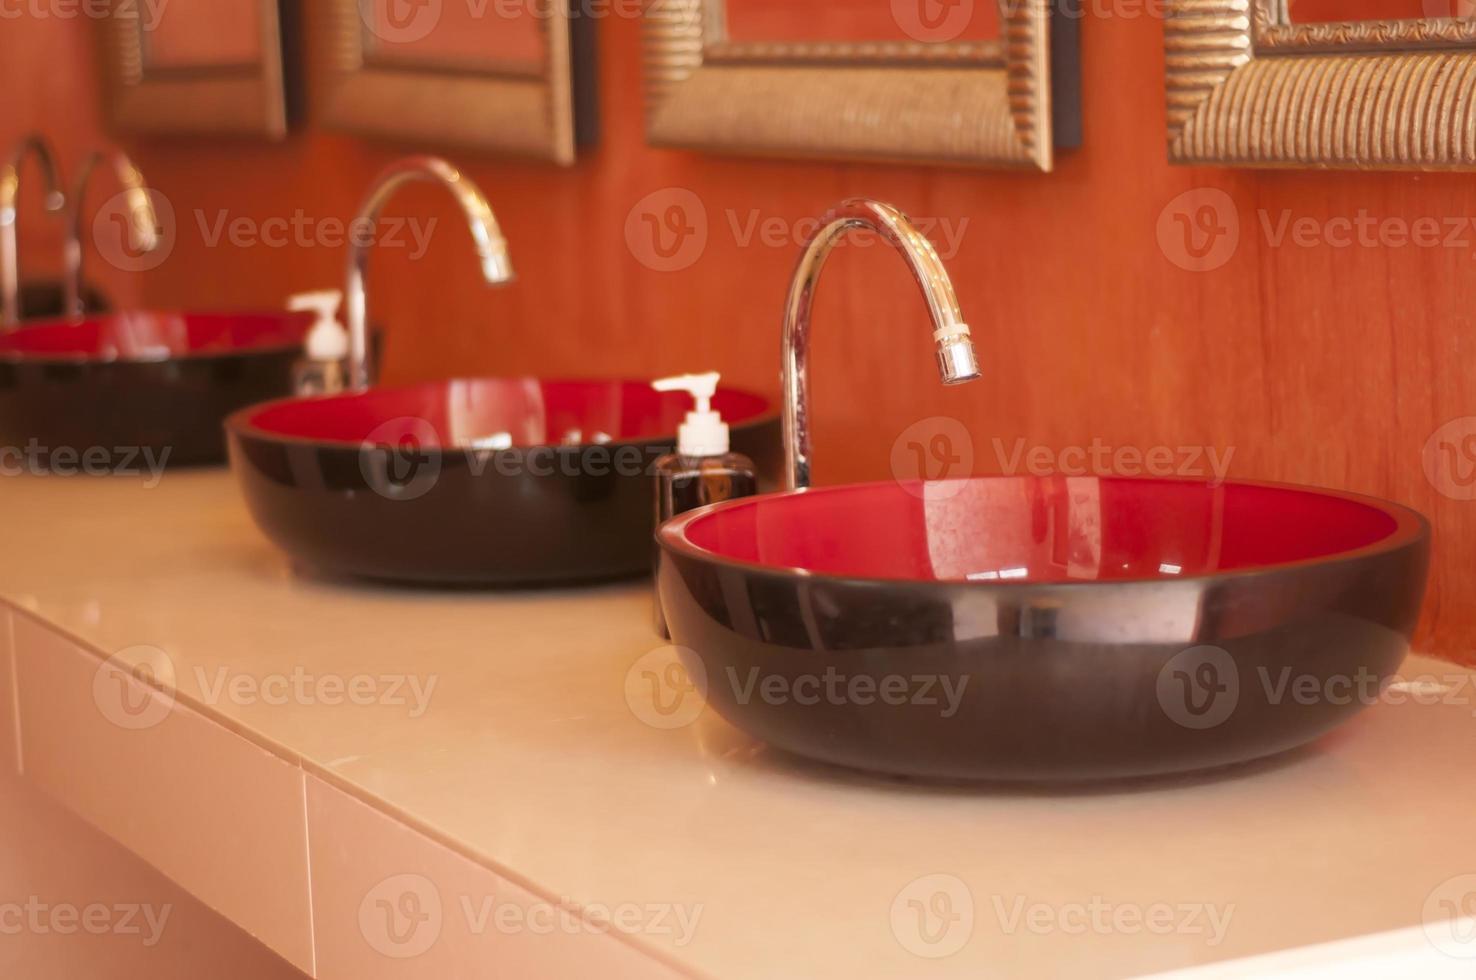 Faucet and lavatory interior design. photo